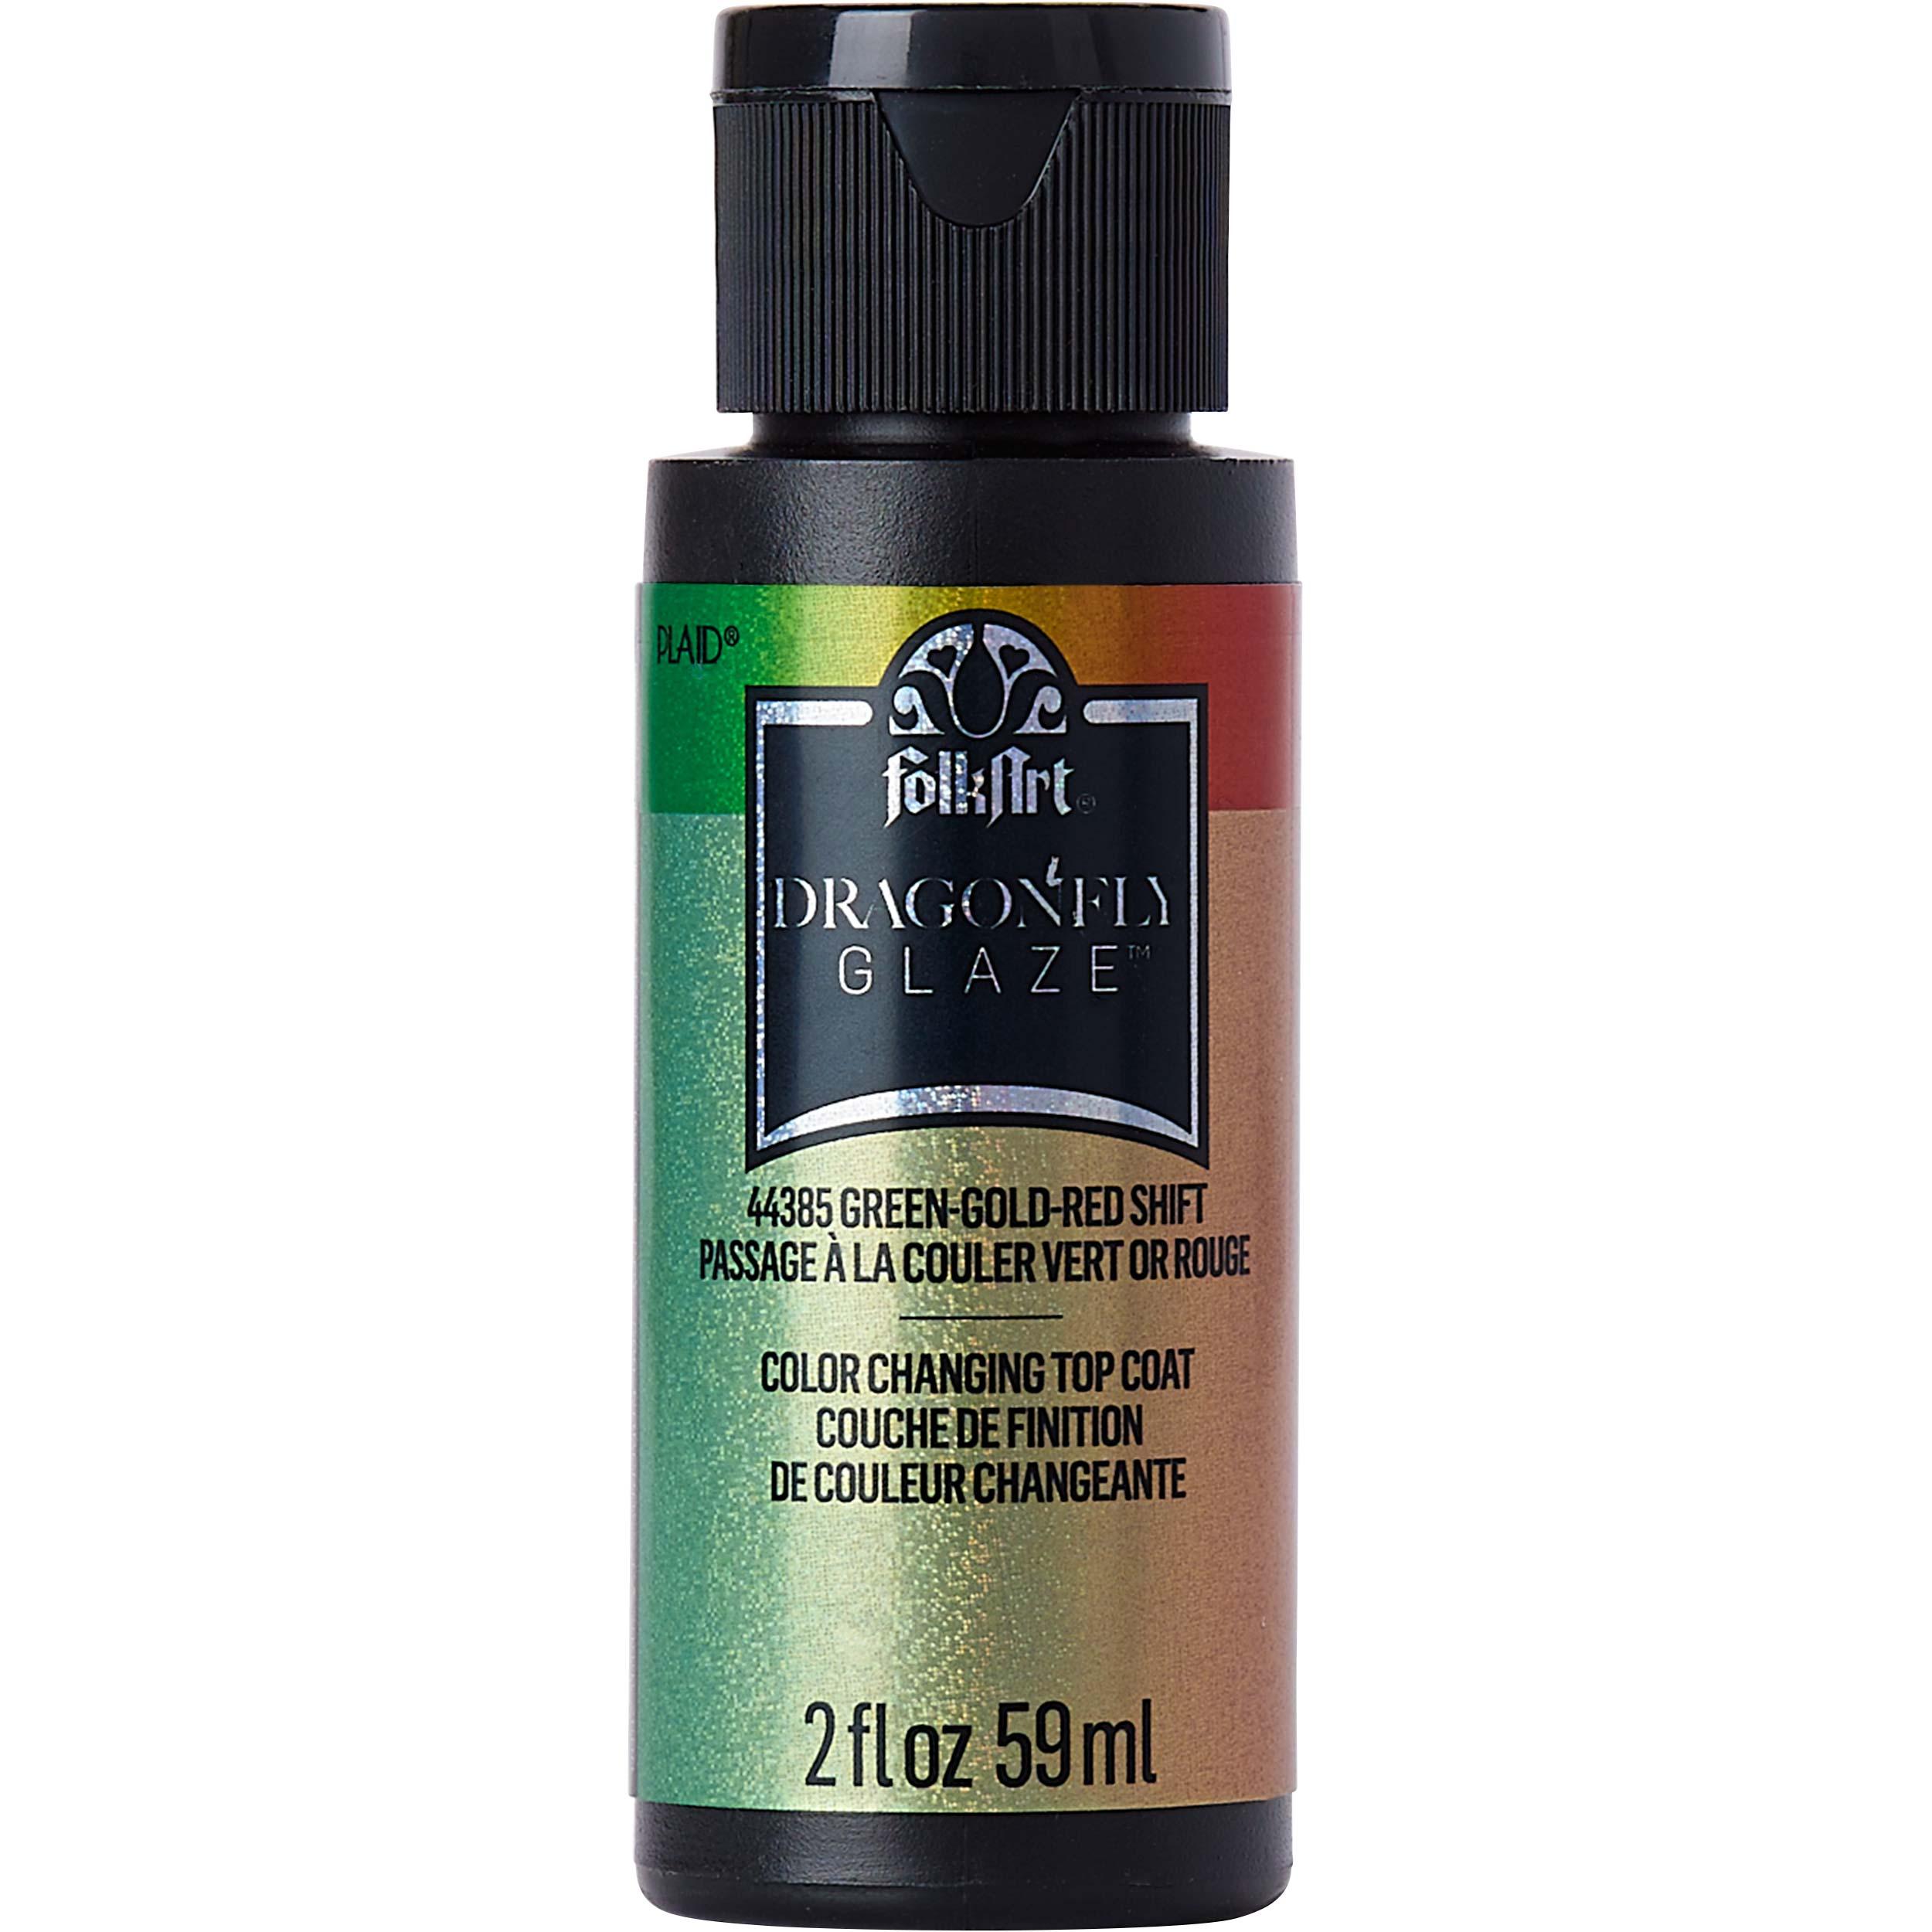 FolkArt ® Dragonfly Glaze™ - Green-Gold-Red, 2 oz. - 44385